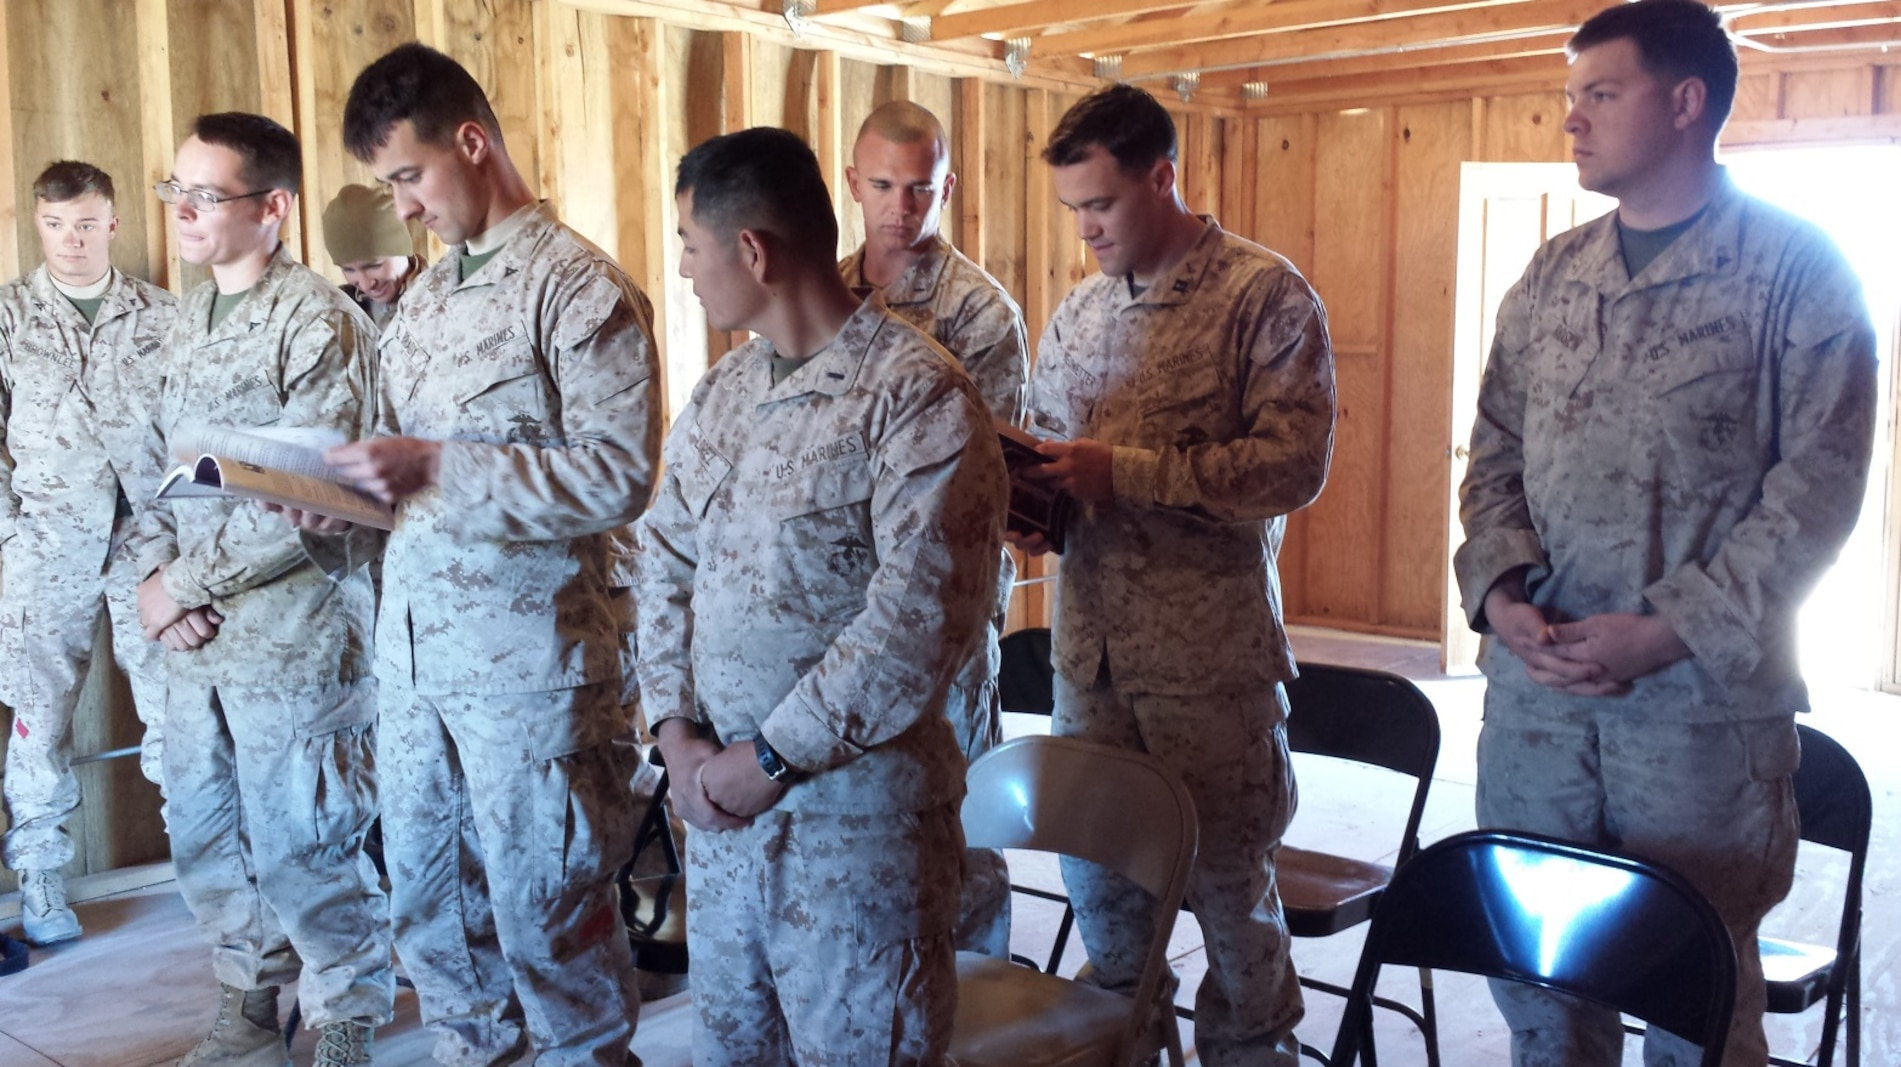 LFT to RT: LCpl Brownlee, LCpl Hurla, Lt Danielle Anderson, LCpl Brady, 1st Lt Heriberto Lopez, 1st Lt A.J. Gerdes, Capt David Huewetter, LCpl Rosen